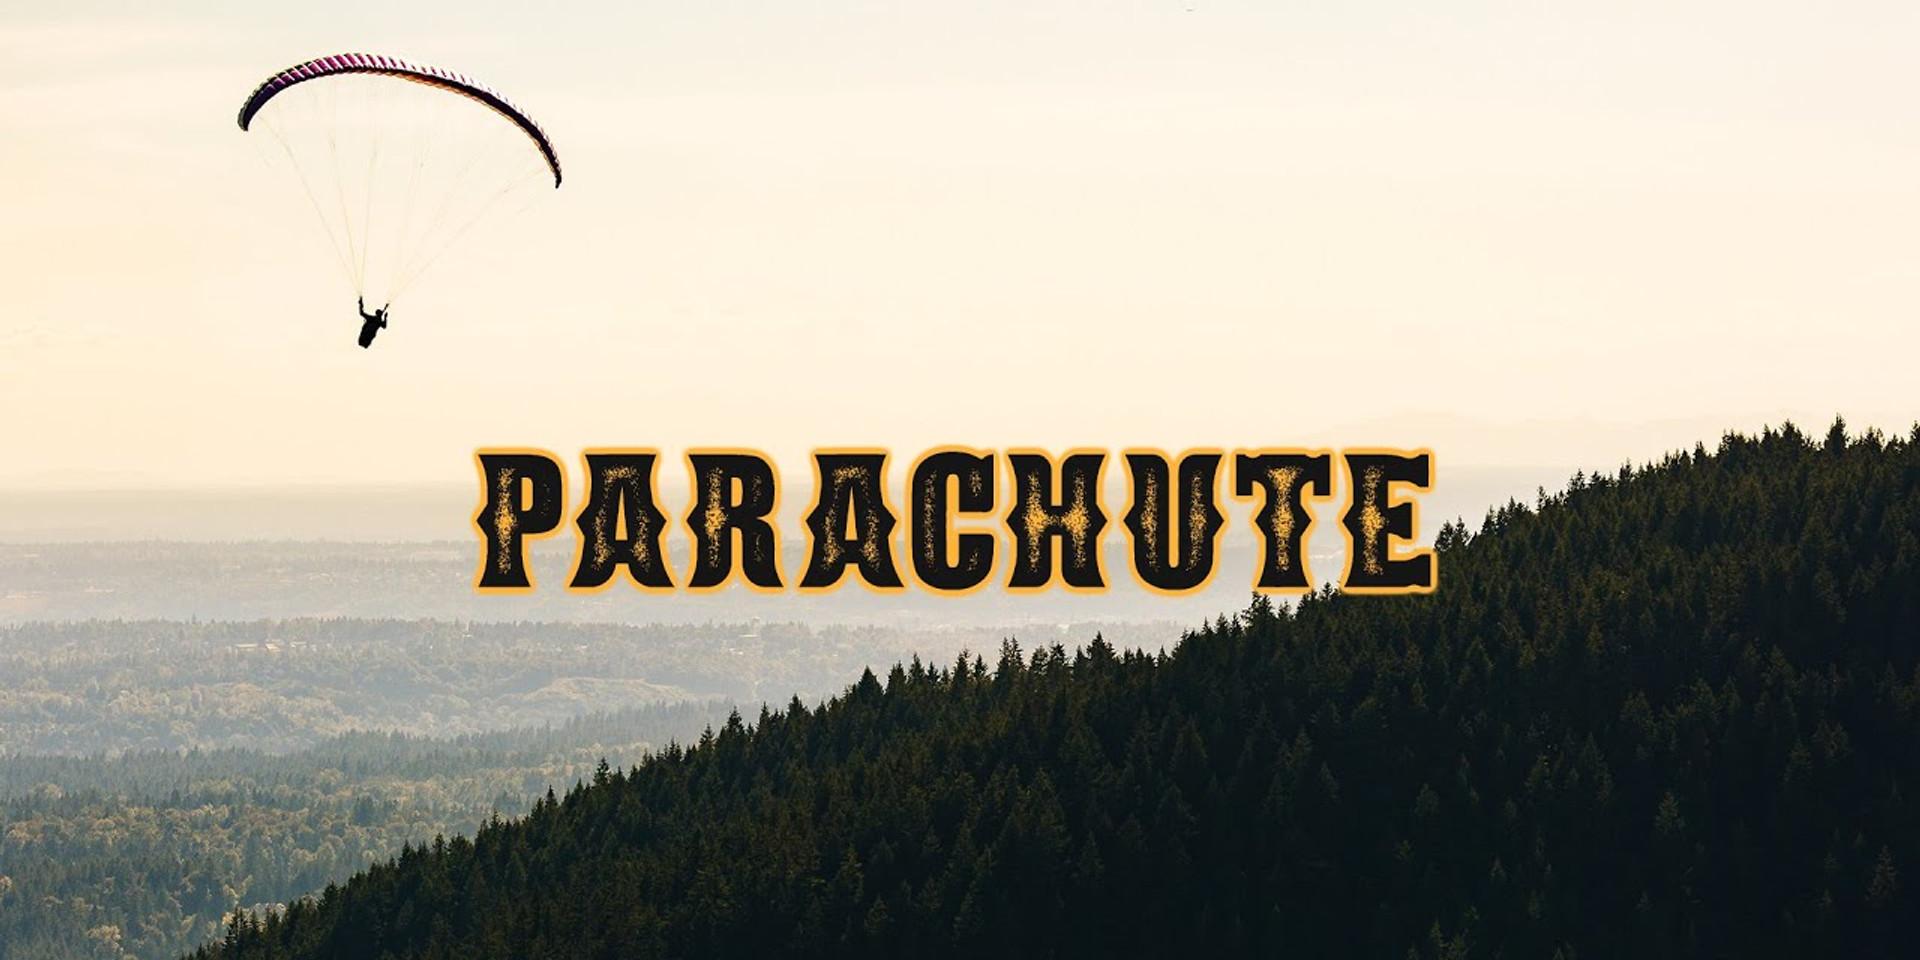 Nikki Wozzo - Parachute